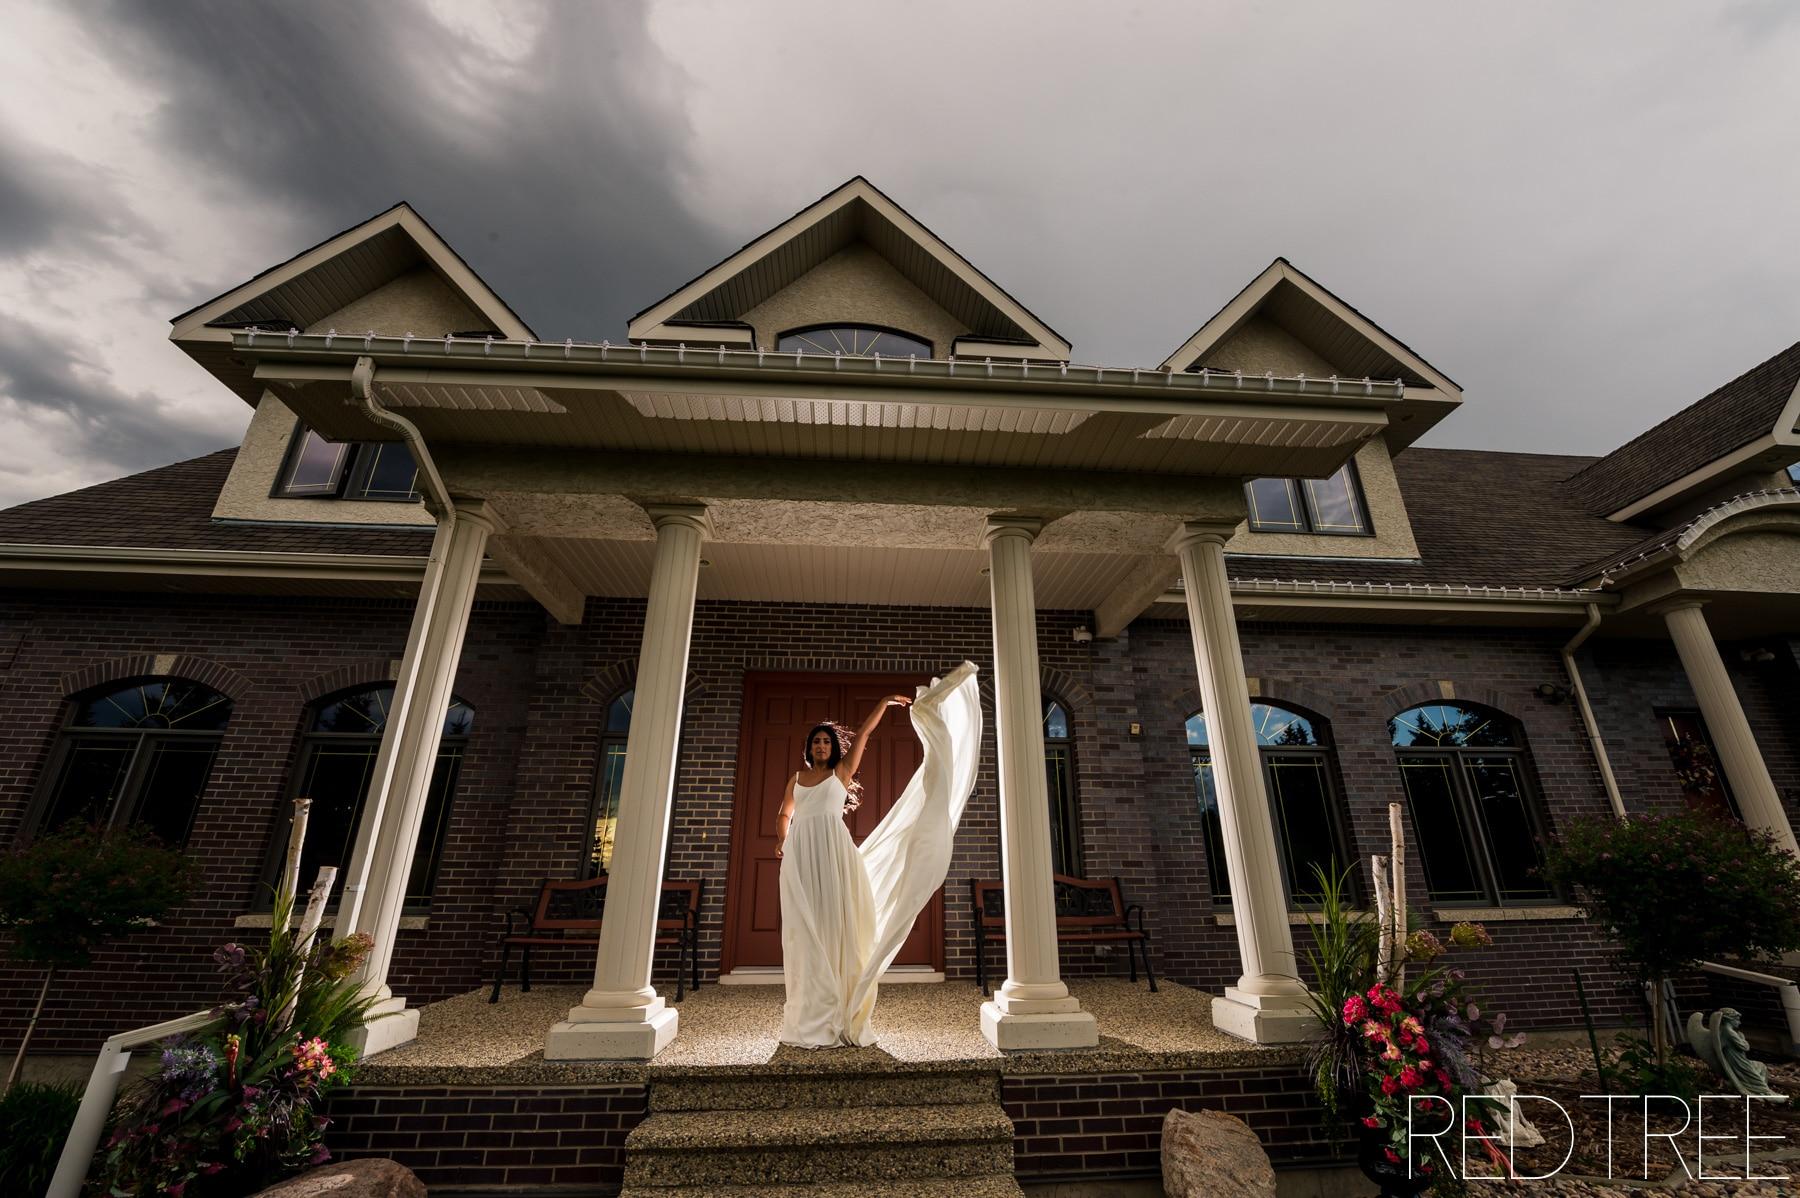 The Cornerstone Stylized Wedding: Bottled Bronco & The Cornerstone Photography